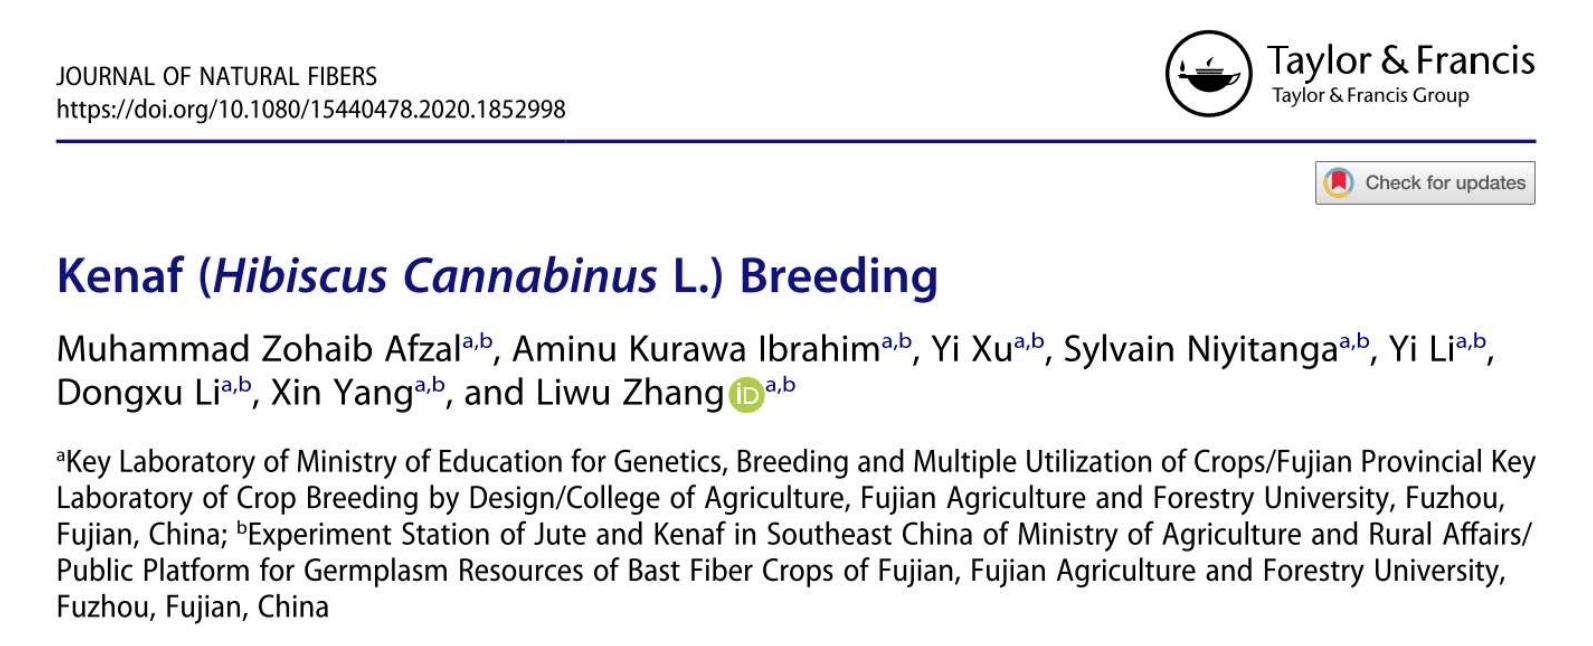 kenaf breeding.png